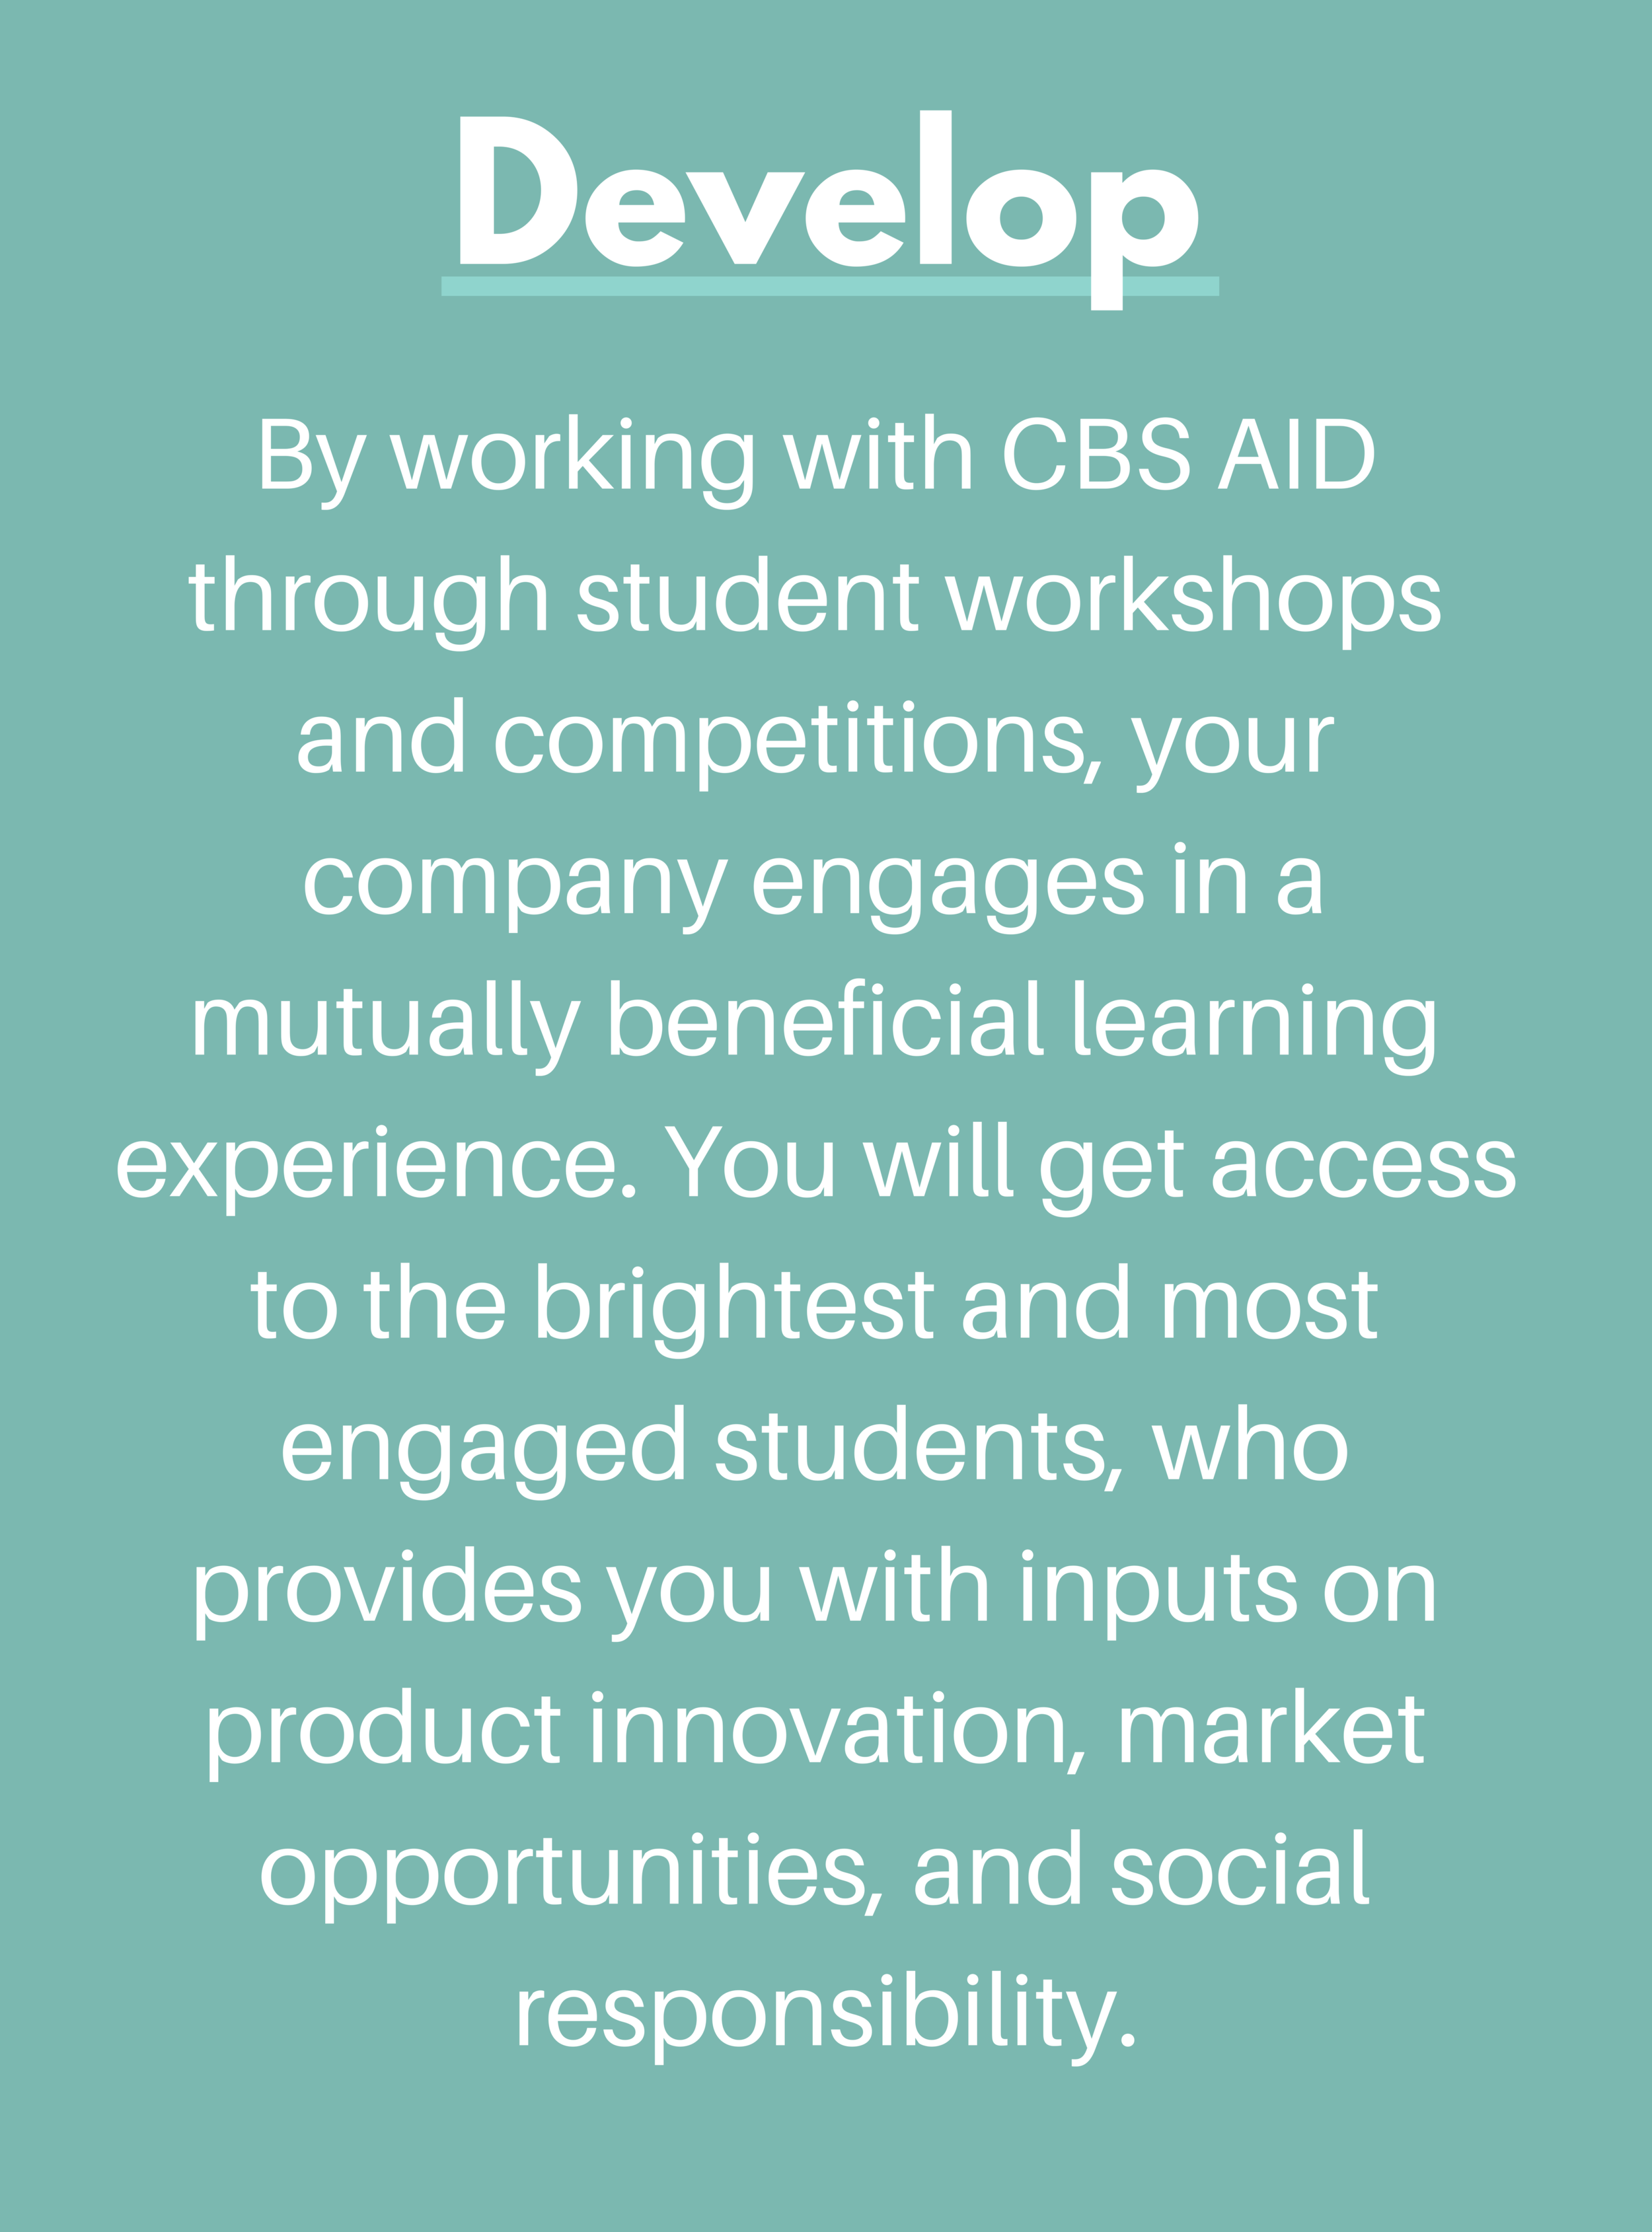 CBS AID Develop Partnership